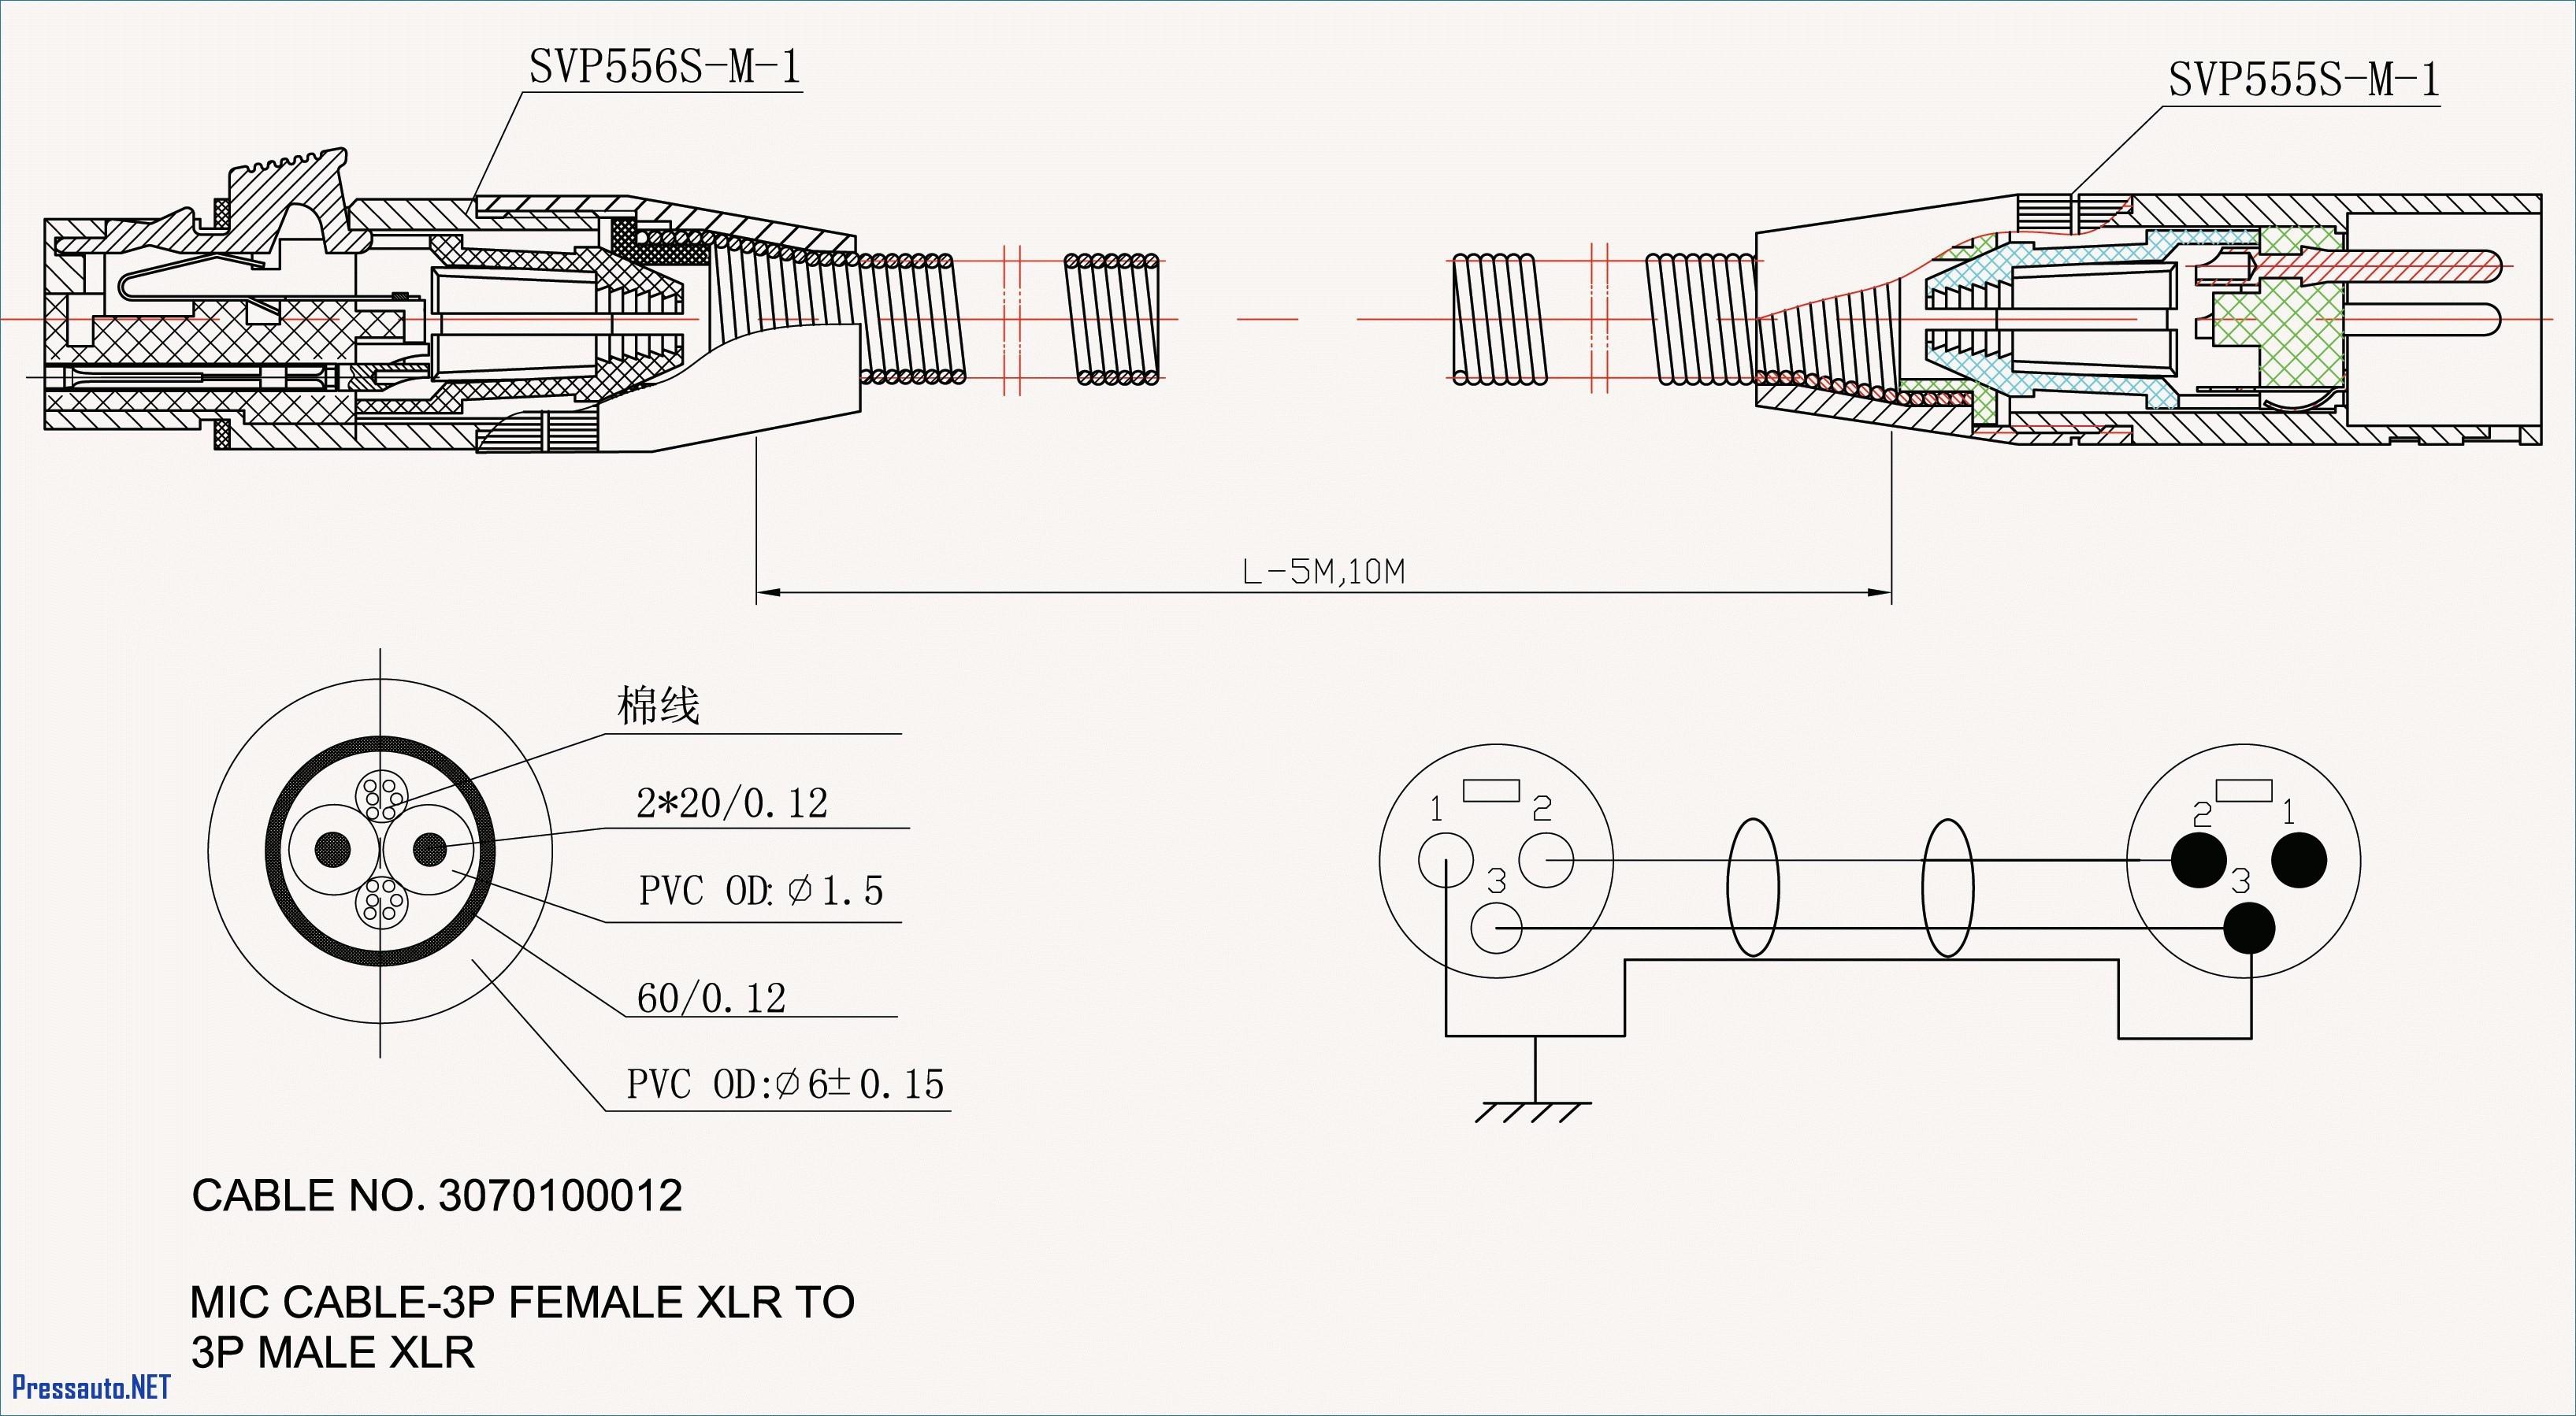 Marine Fuse Block Wiring Diagram Detailed Diagrams Boat Showing Fuses New Image Generator Alternator